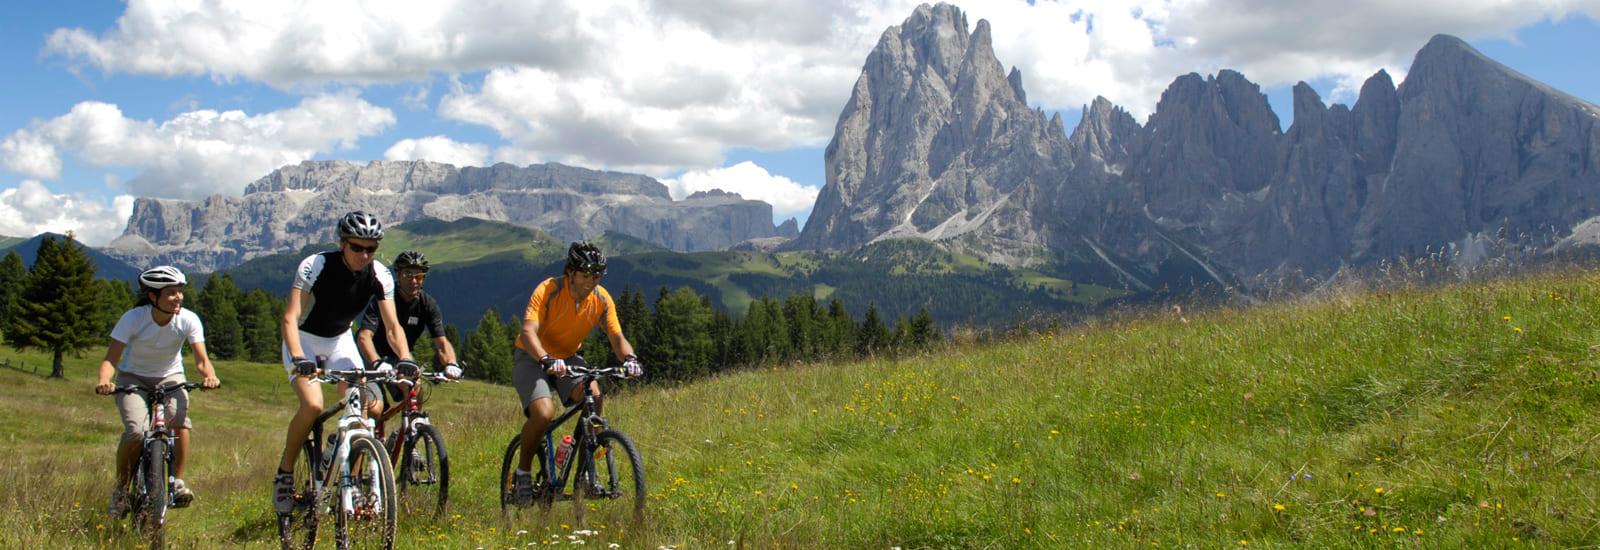 Antermejes Chalet | Sommer in den Dolomiten